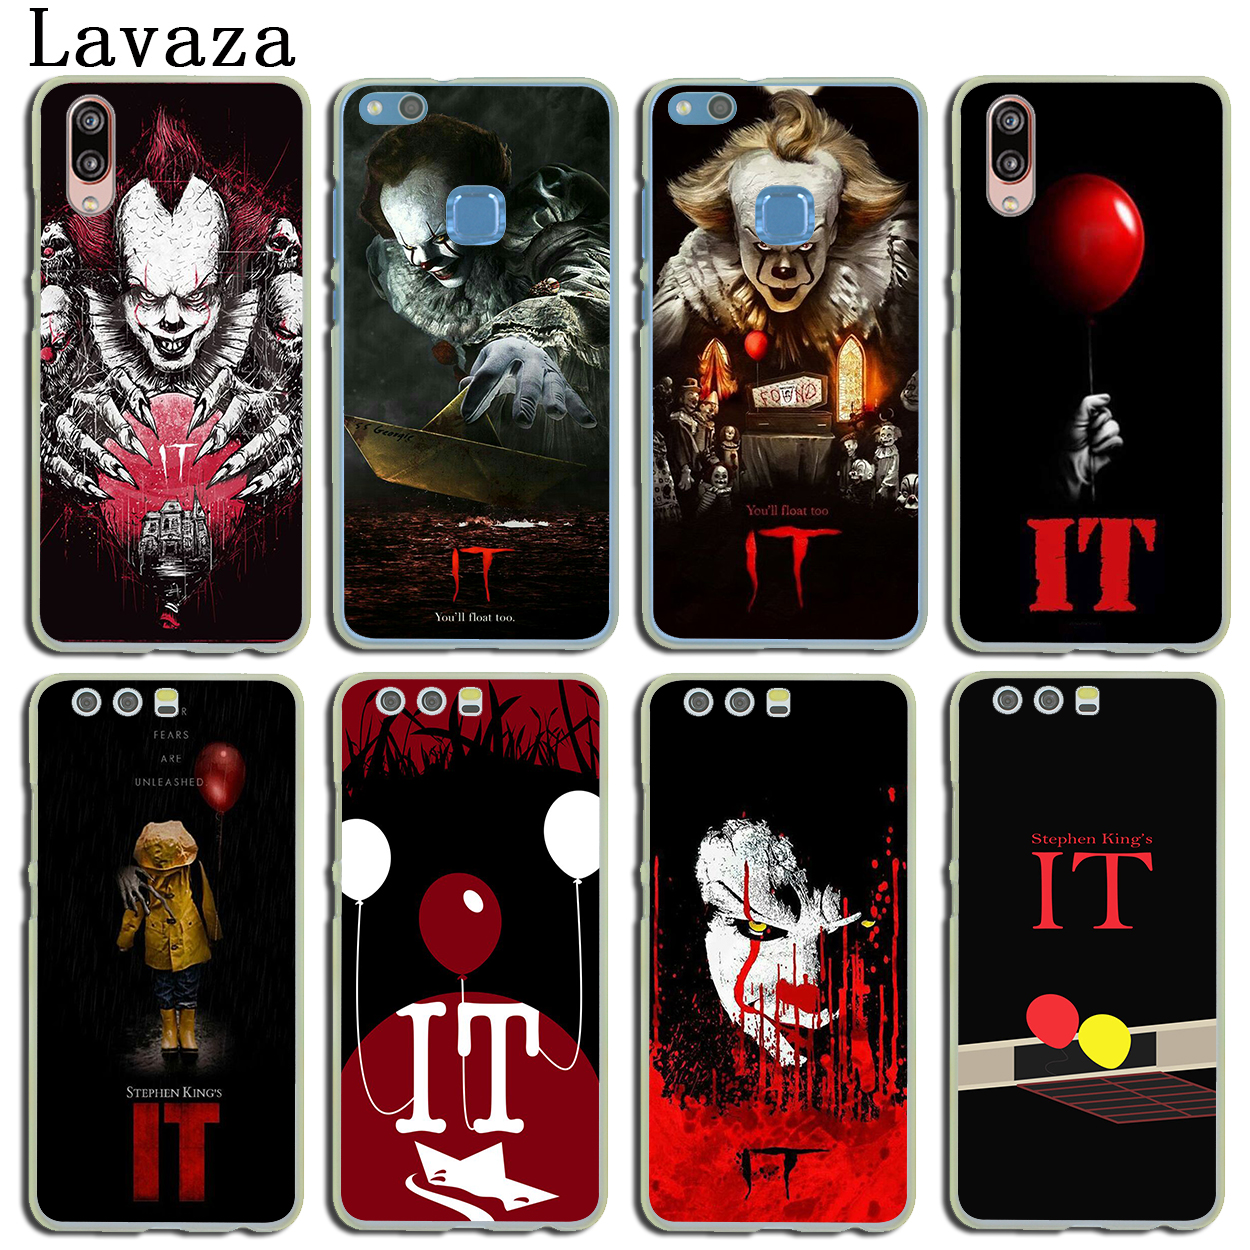 Lavaza Stephen Kings It Phone Cover Case for Huawei P20 P10 P9 Plus P8 Lite Mini 2015 2016 2017 P smart Mate 9 10 Lite Pro